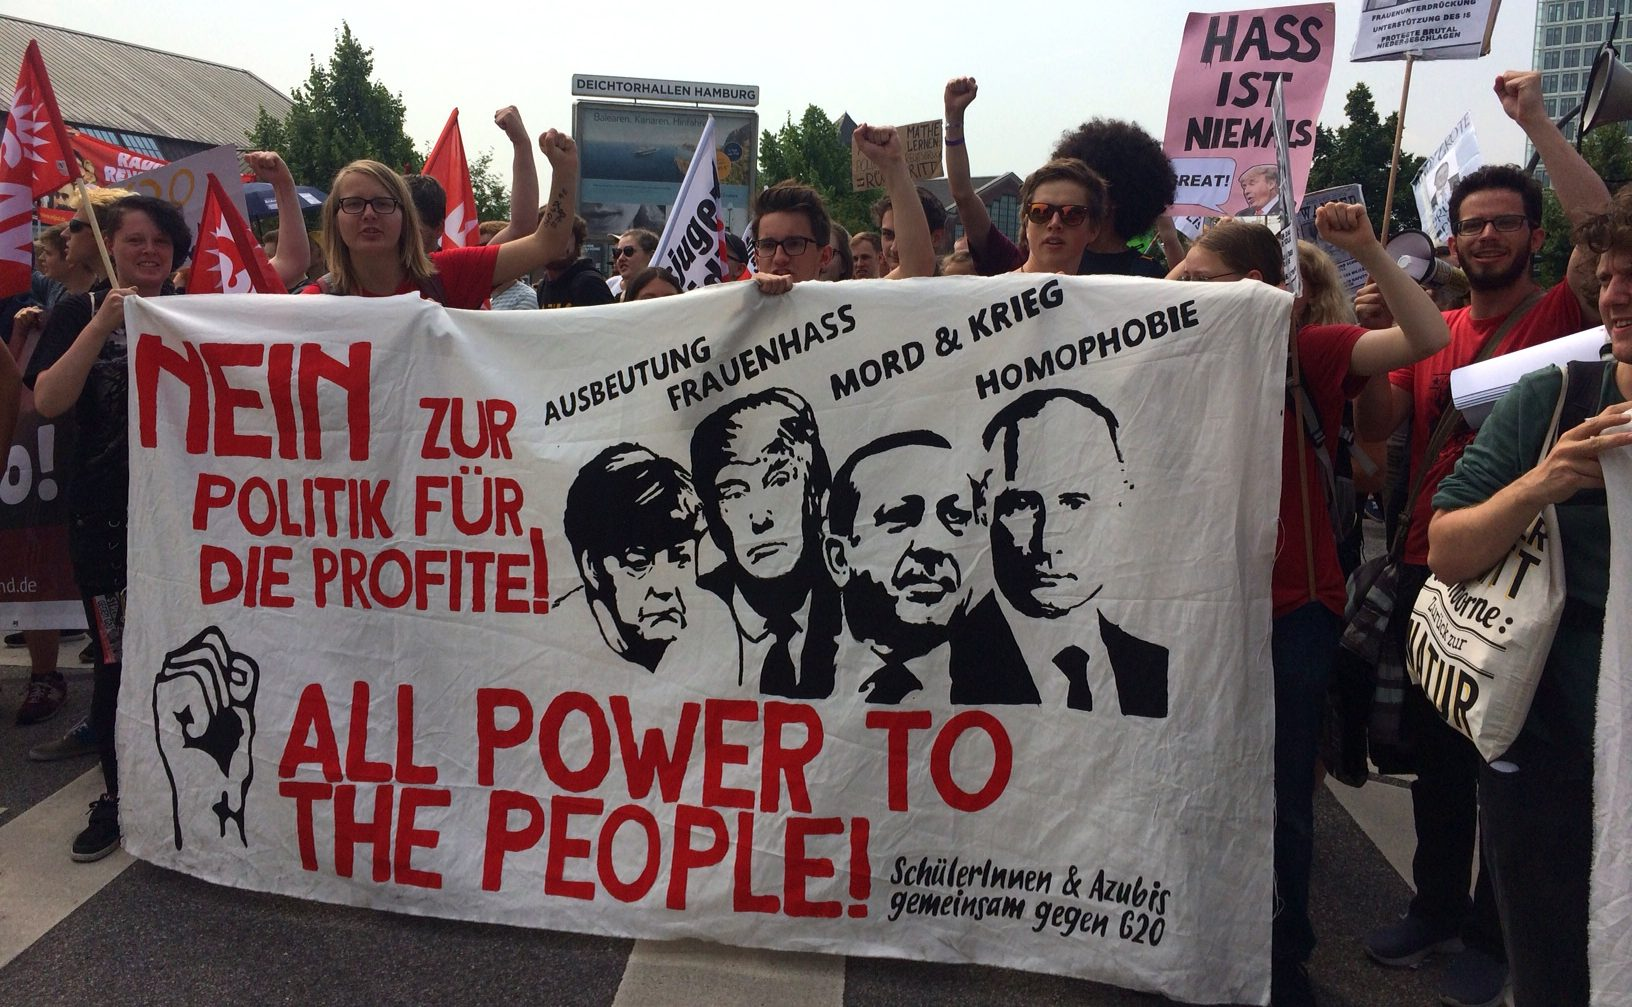 G20: de top van de repressie